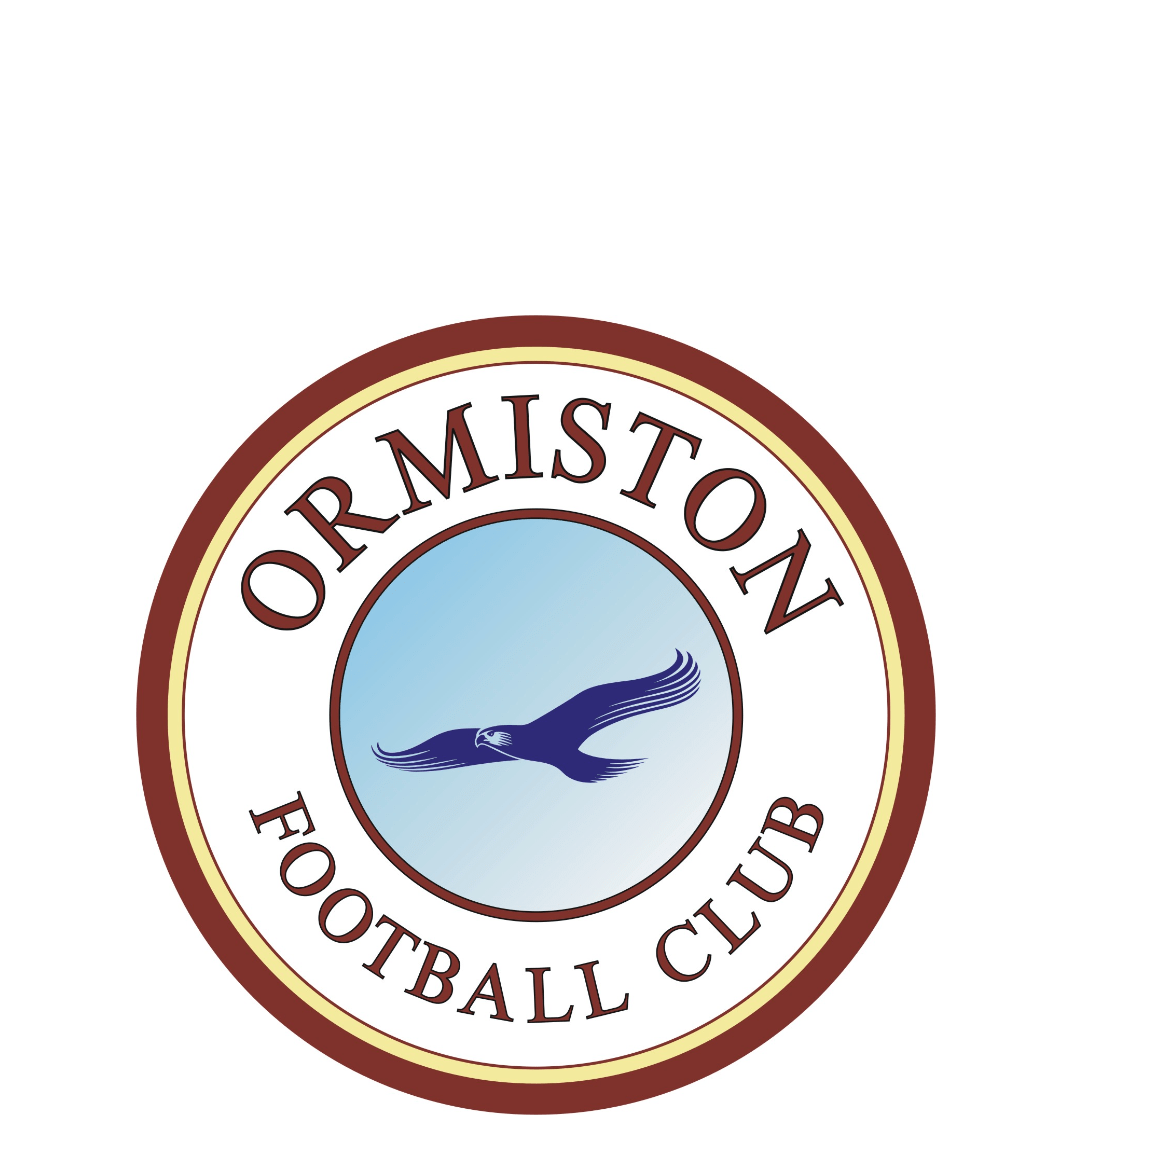 Ormiston Football Club